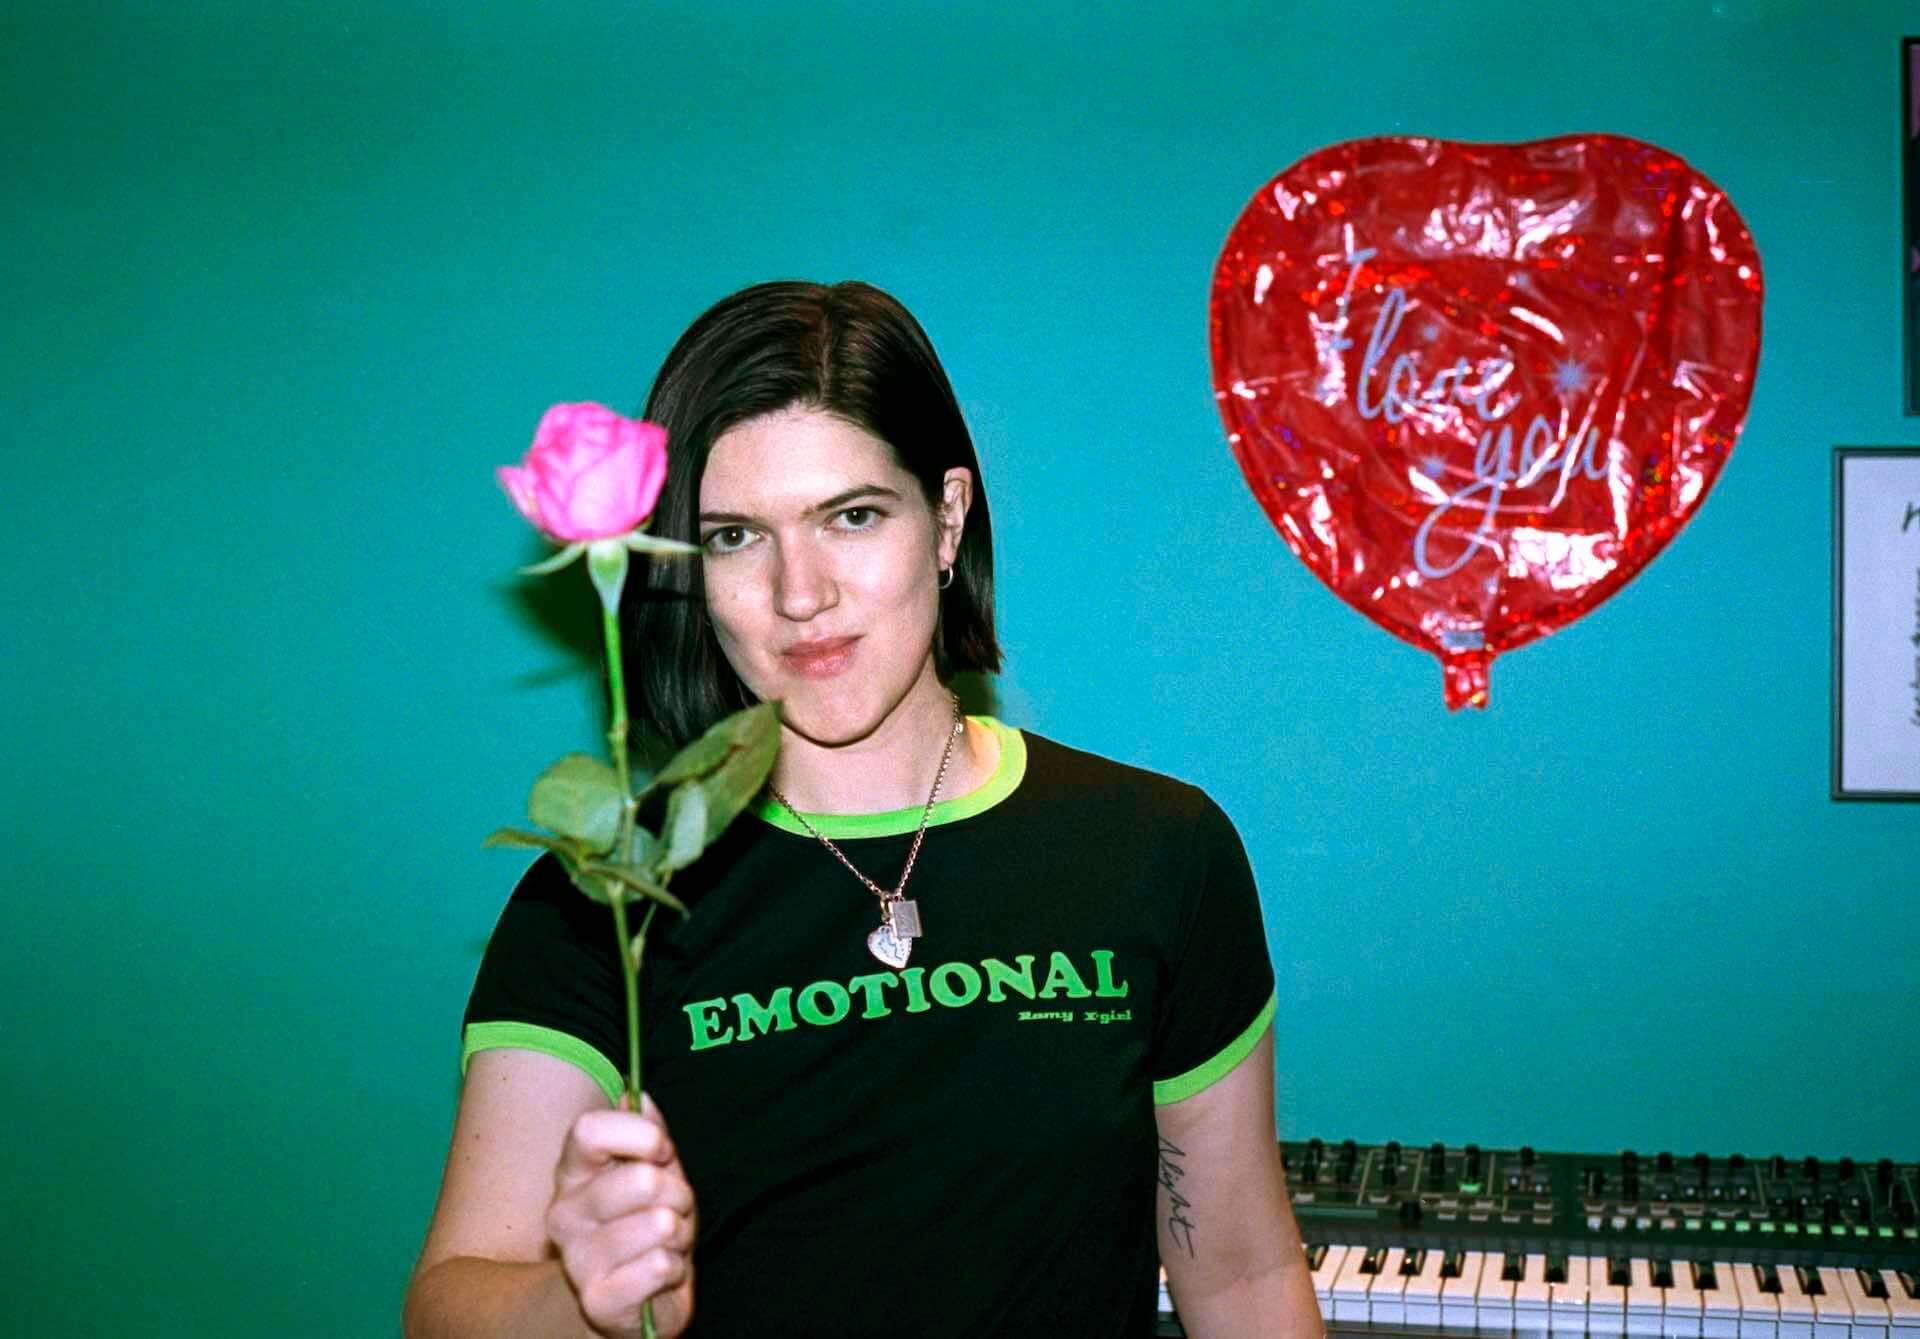 The xxのRomyとX-girlによるコラボアイテム第2弾が発表!本人出演のInstagramライブも実施決定 music210208_romy_9-1920x1339